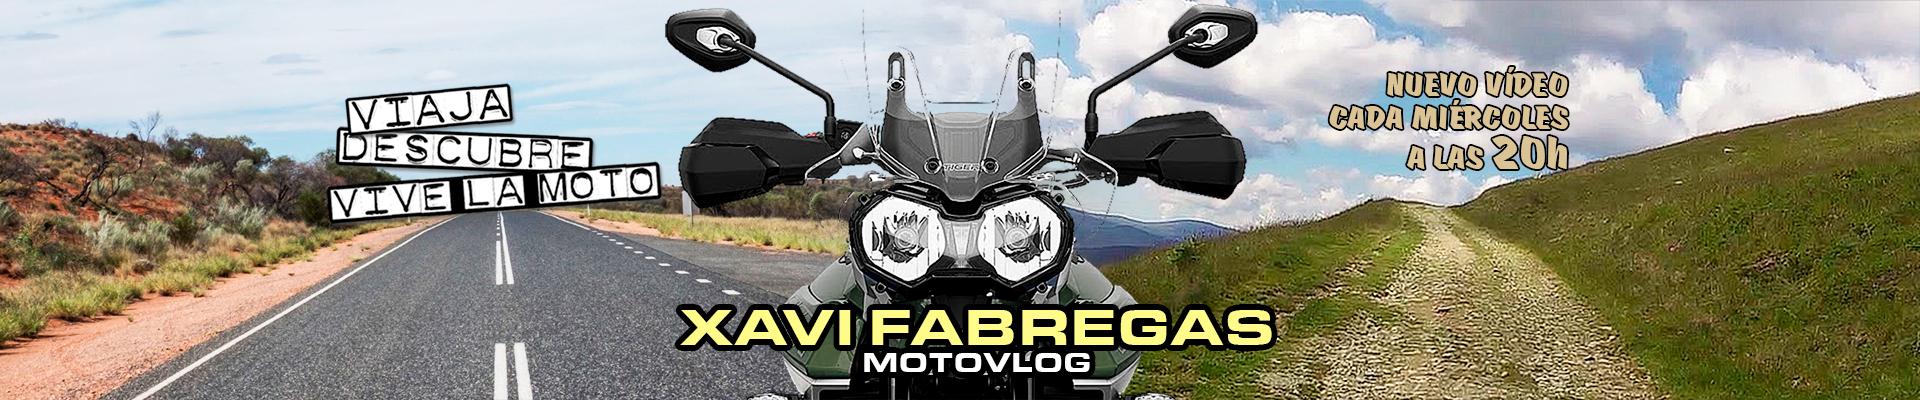 XaviFabregas Motovlog